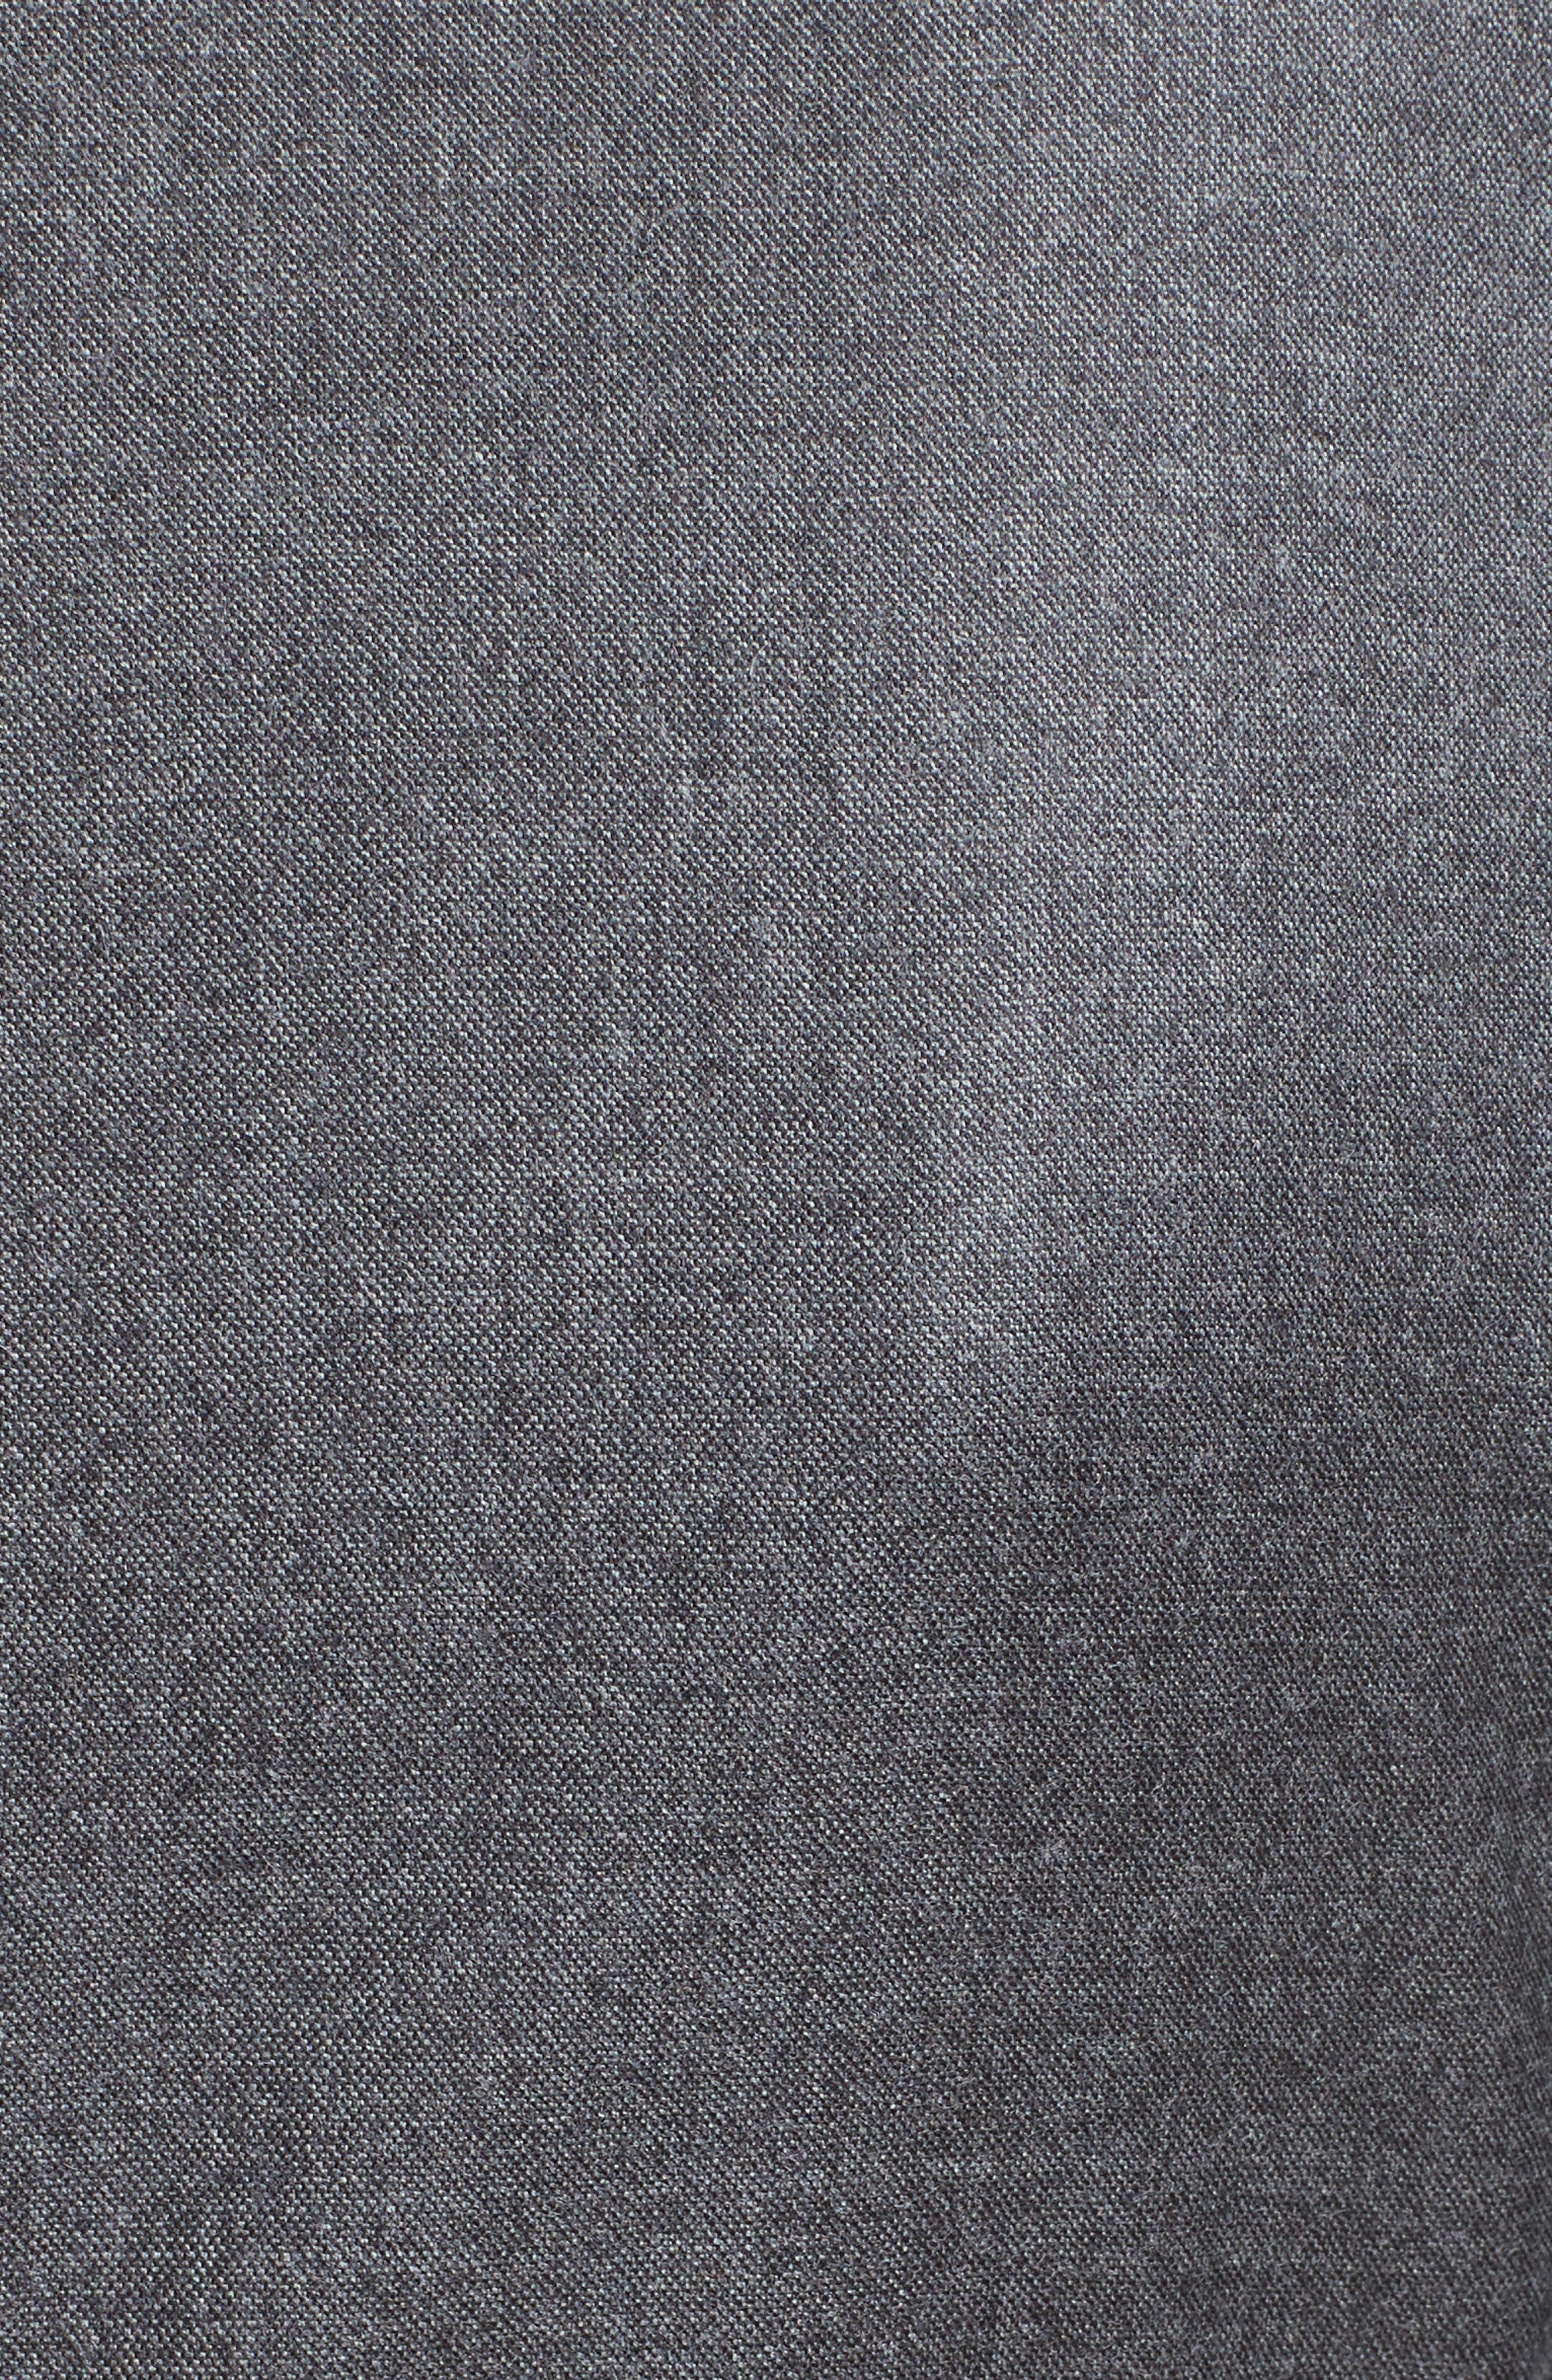 Ragazza Gathered Wool Dress,                             Alternate thumbnail 3, color,                             Dark Grey